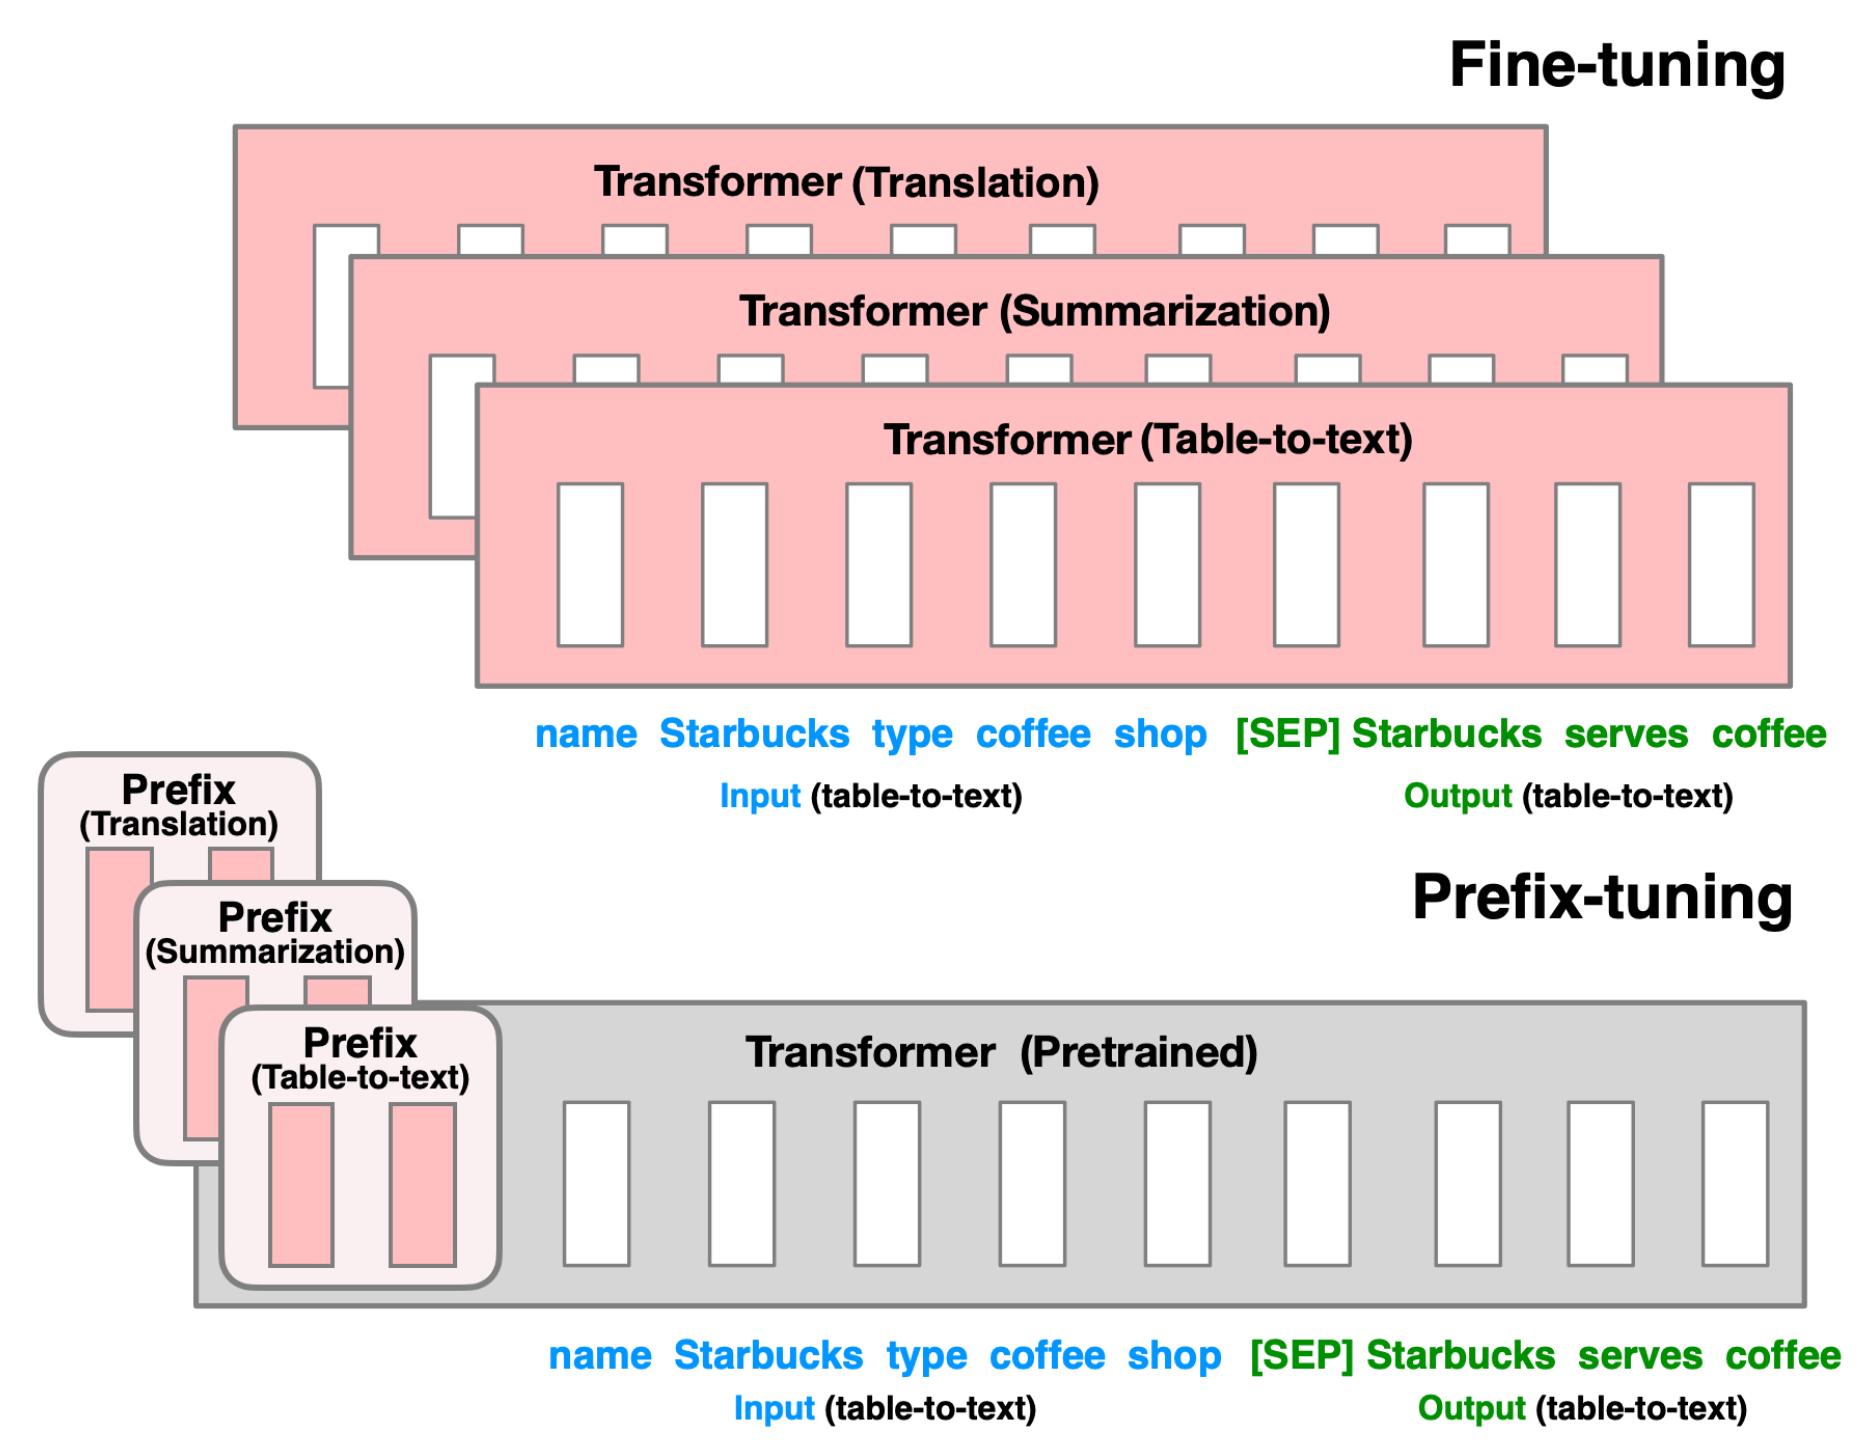 Illustations of fine-tuning versus prefix-tuning.